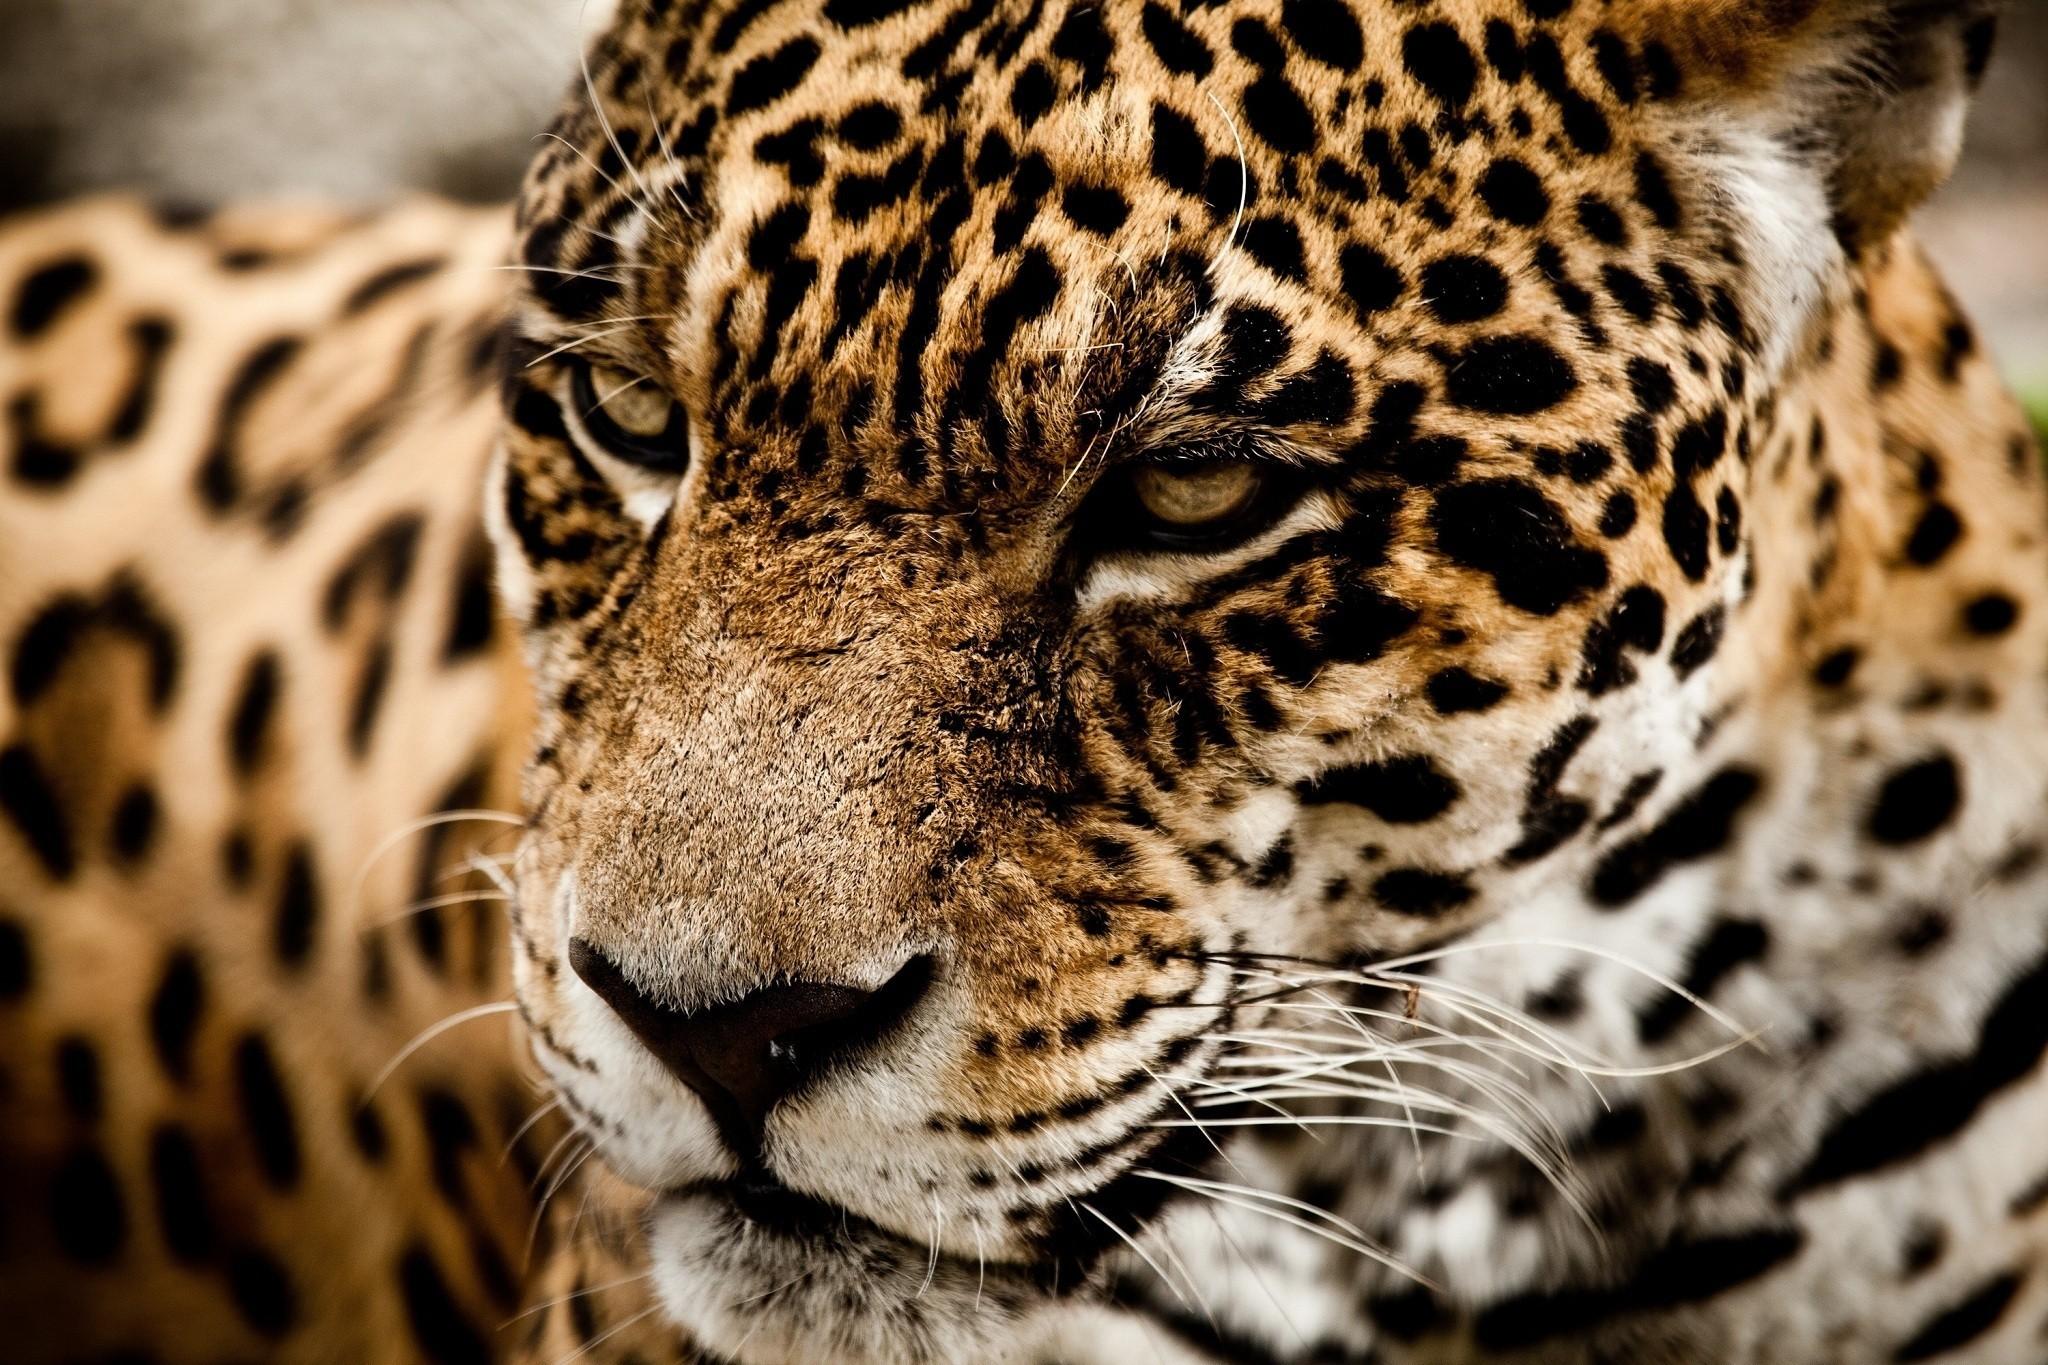 Фото с леопардом на аву в